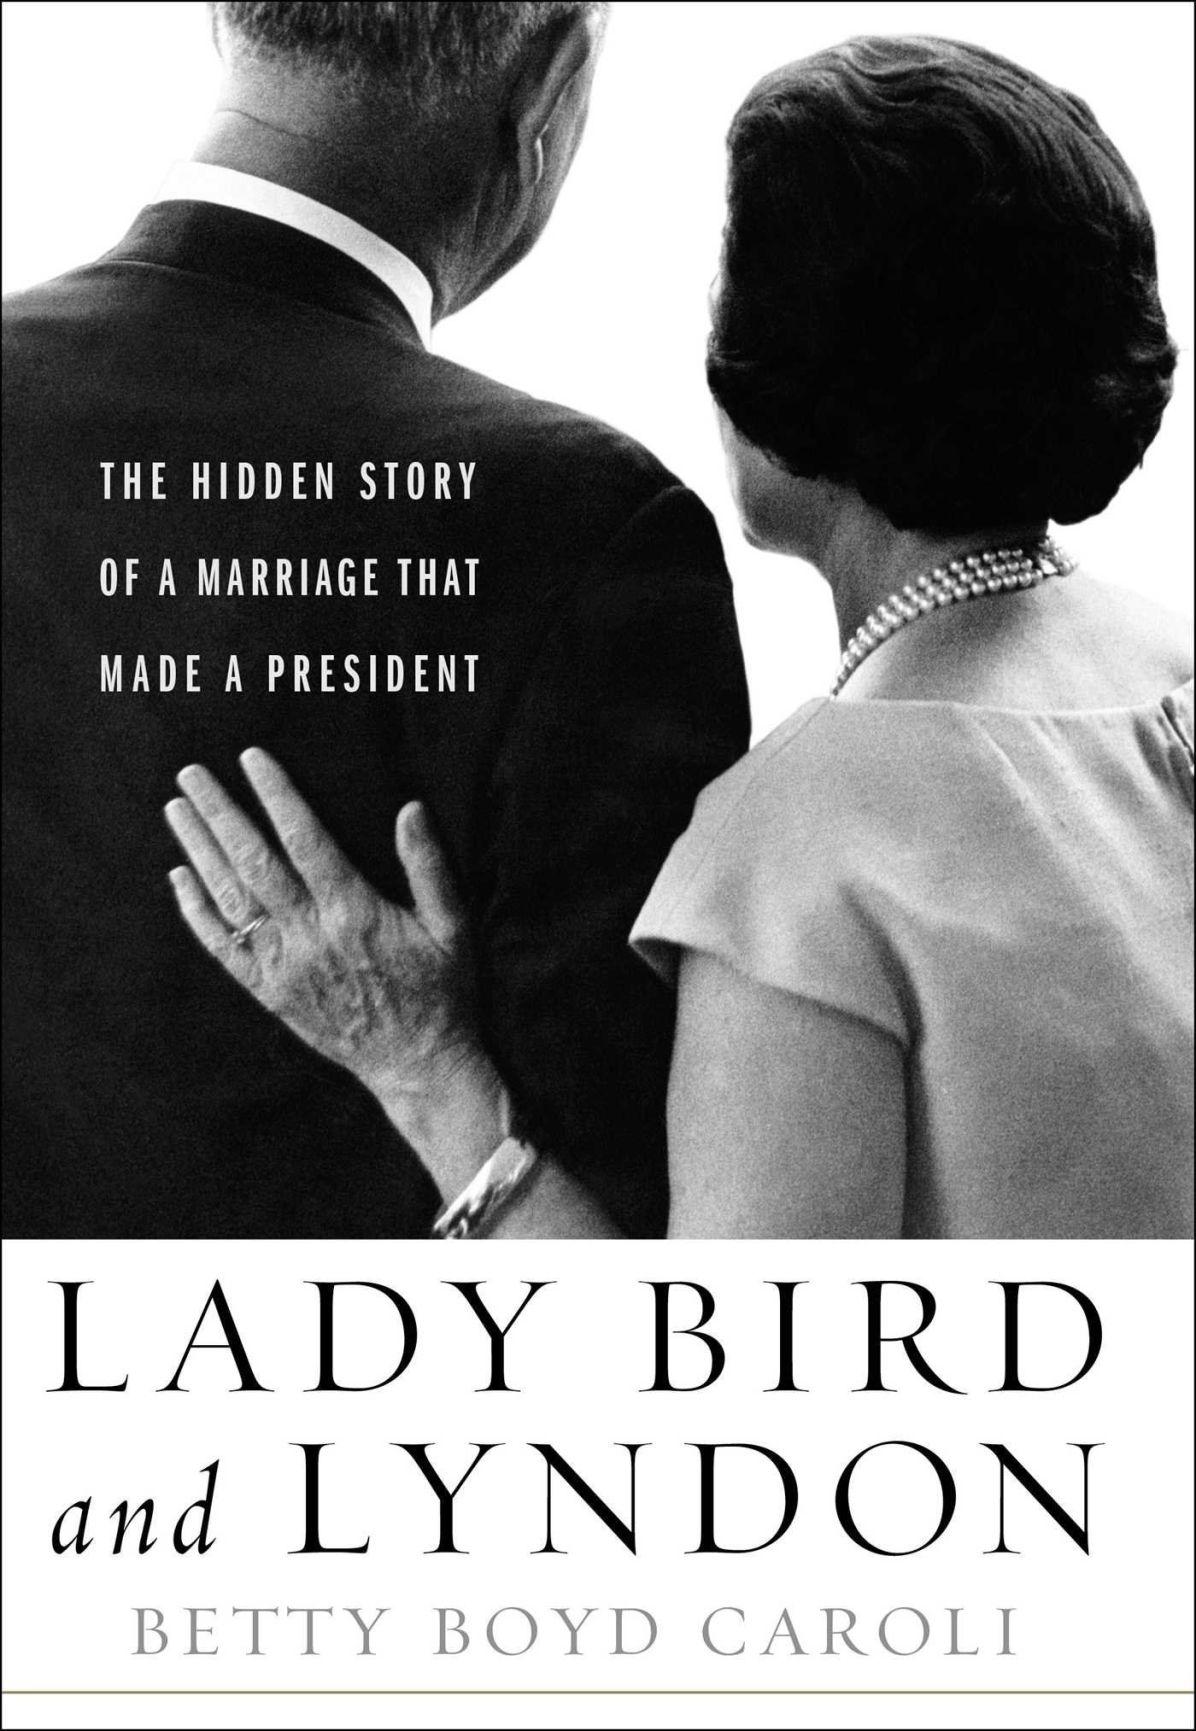 'Lady Bird and Lyndon'